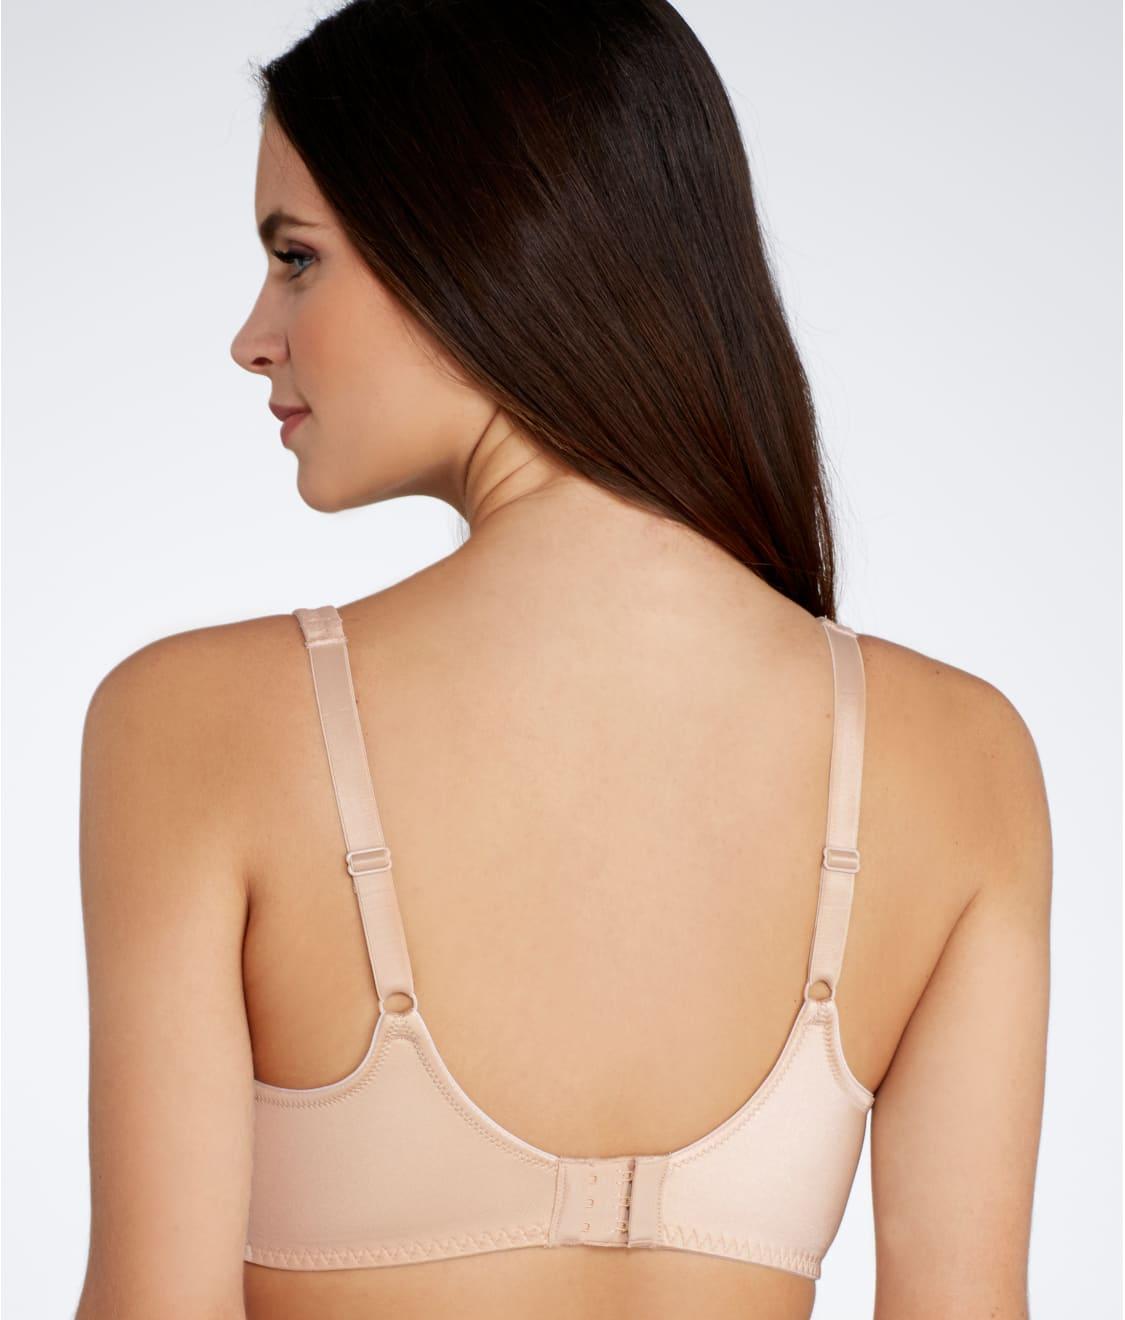 ead04ef4bde Lilyette Beautiful Support Lace Minimizer Bra